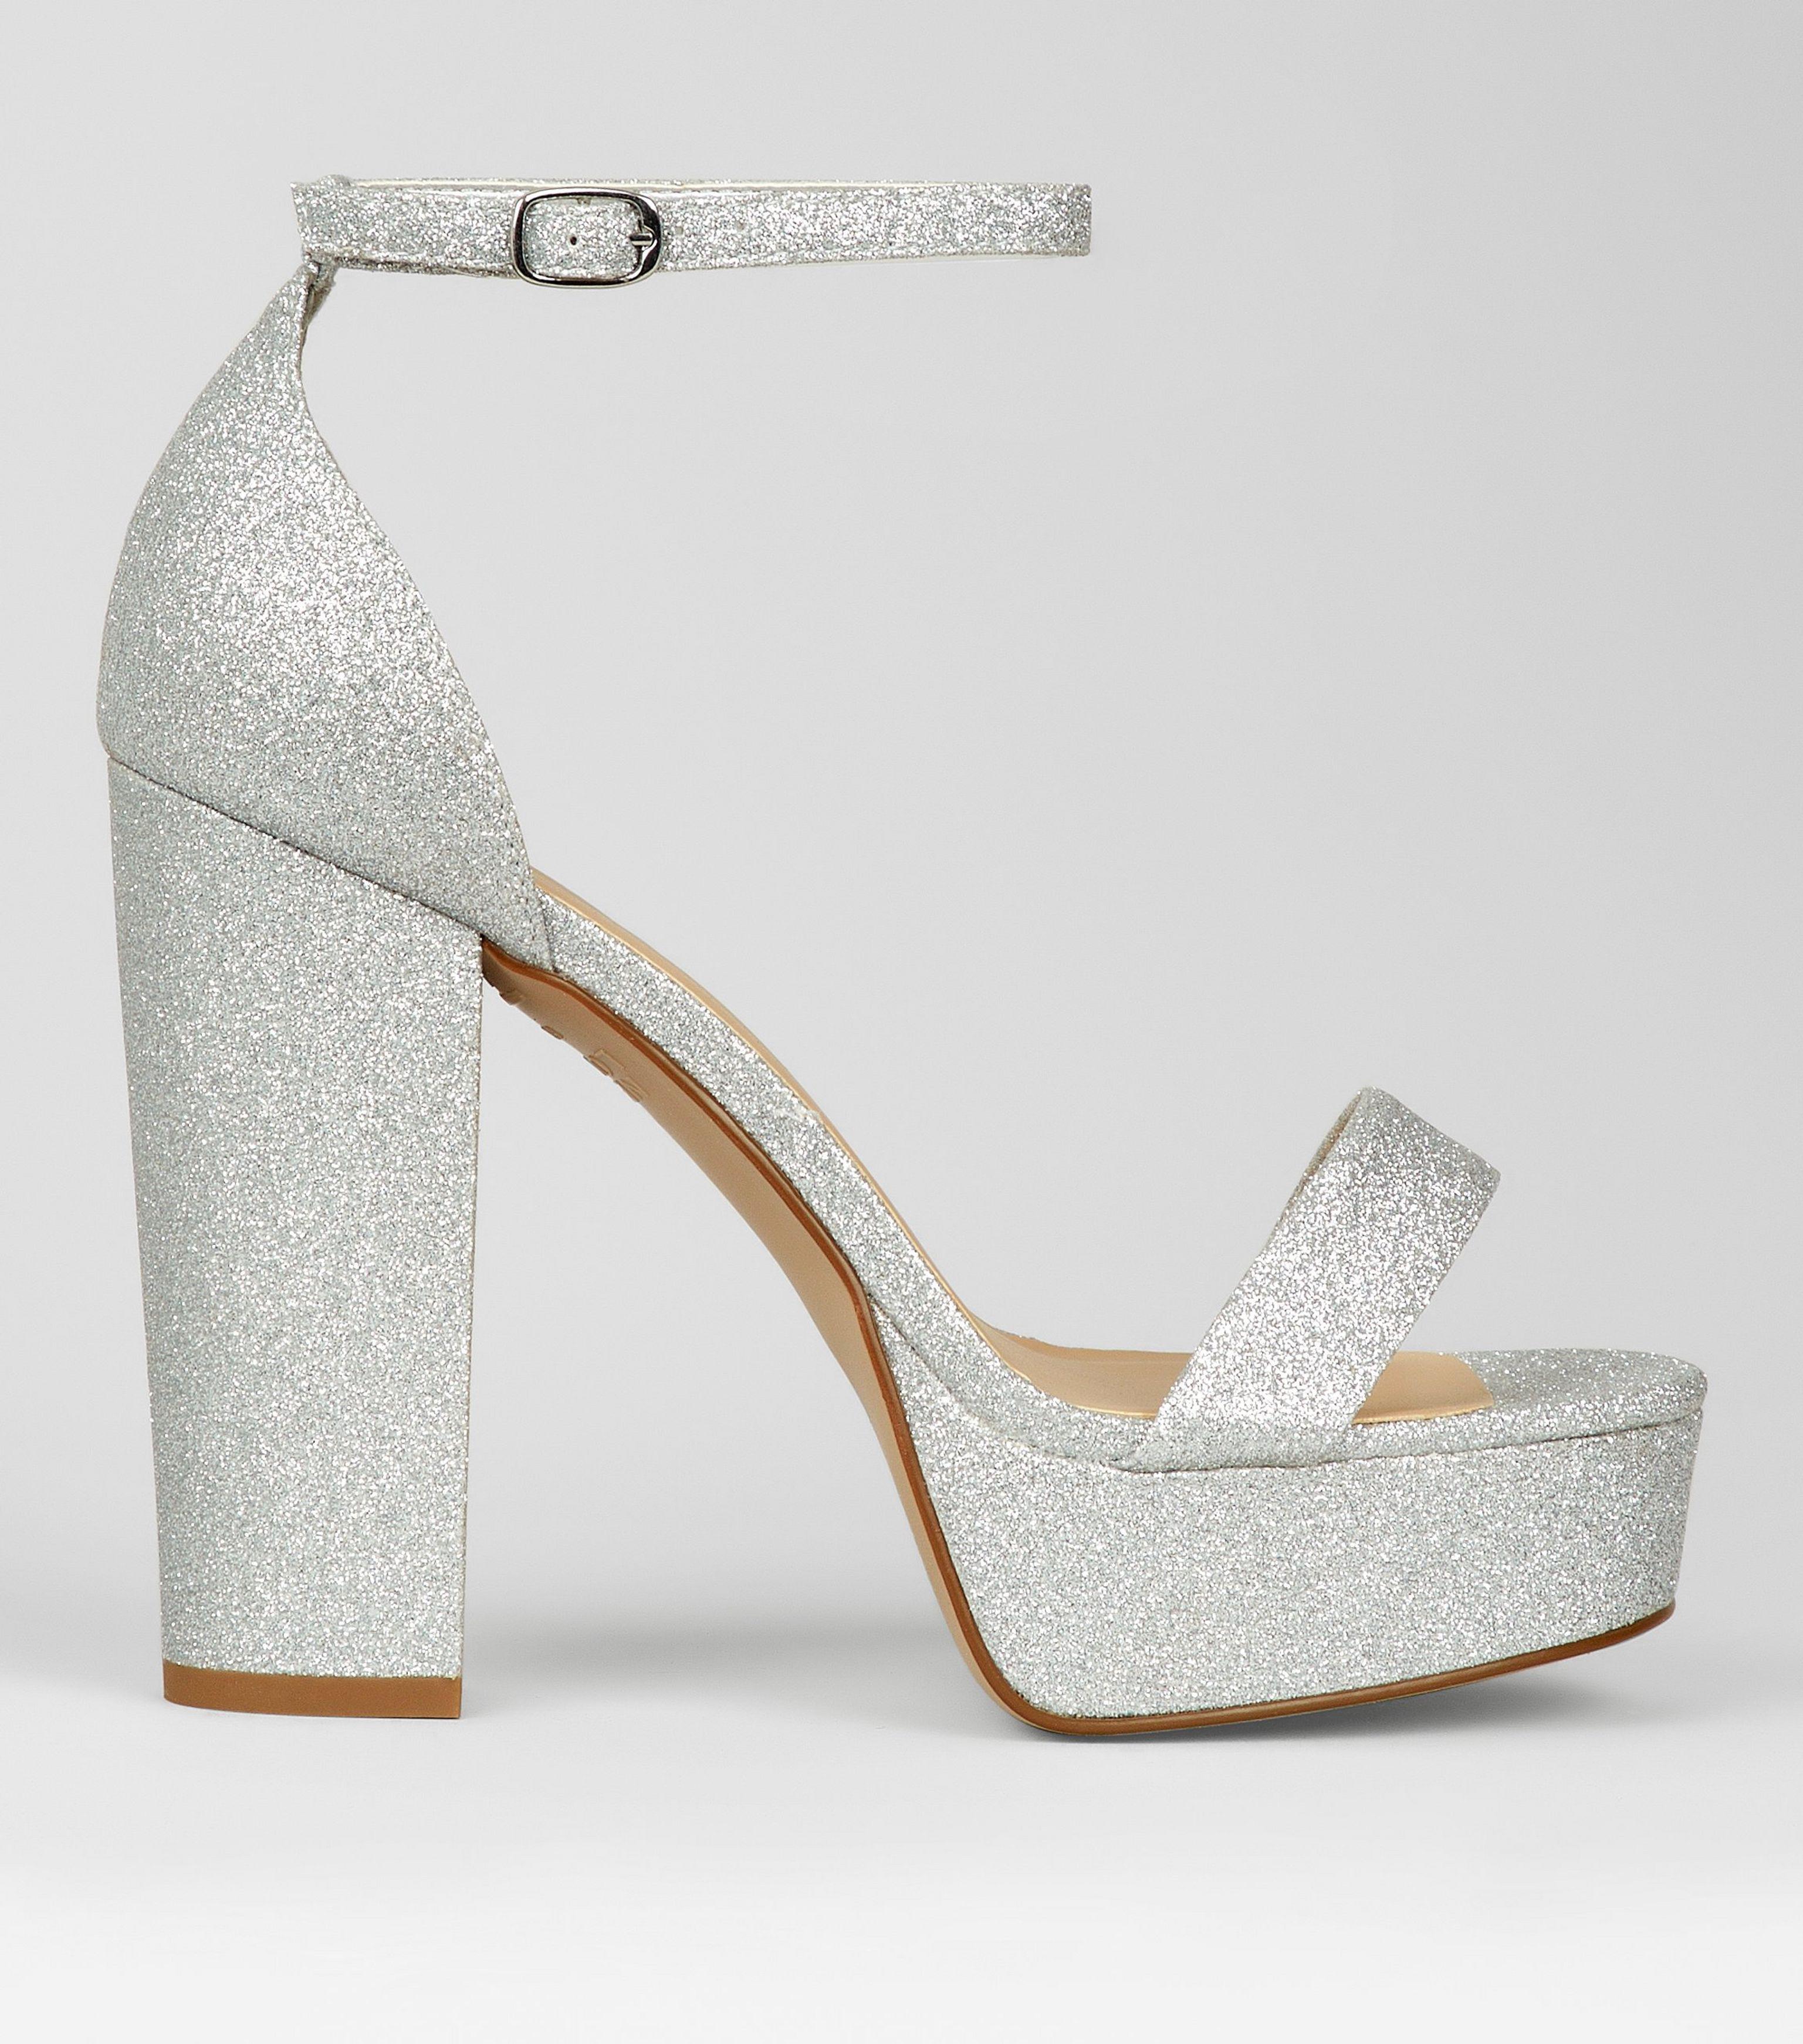 cb9df5822 New Look Wide Fit Silver Glitter Platform Heels in Metallic - Lyst